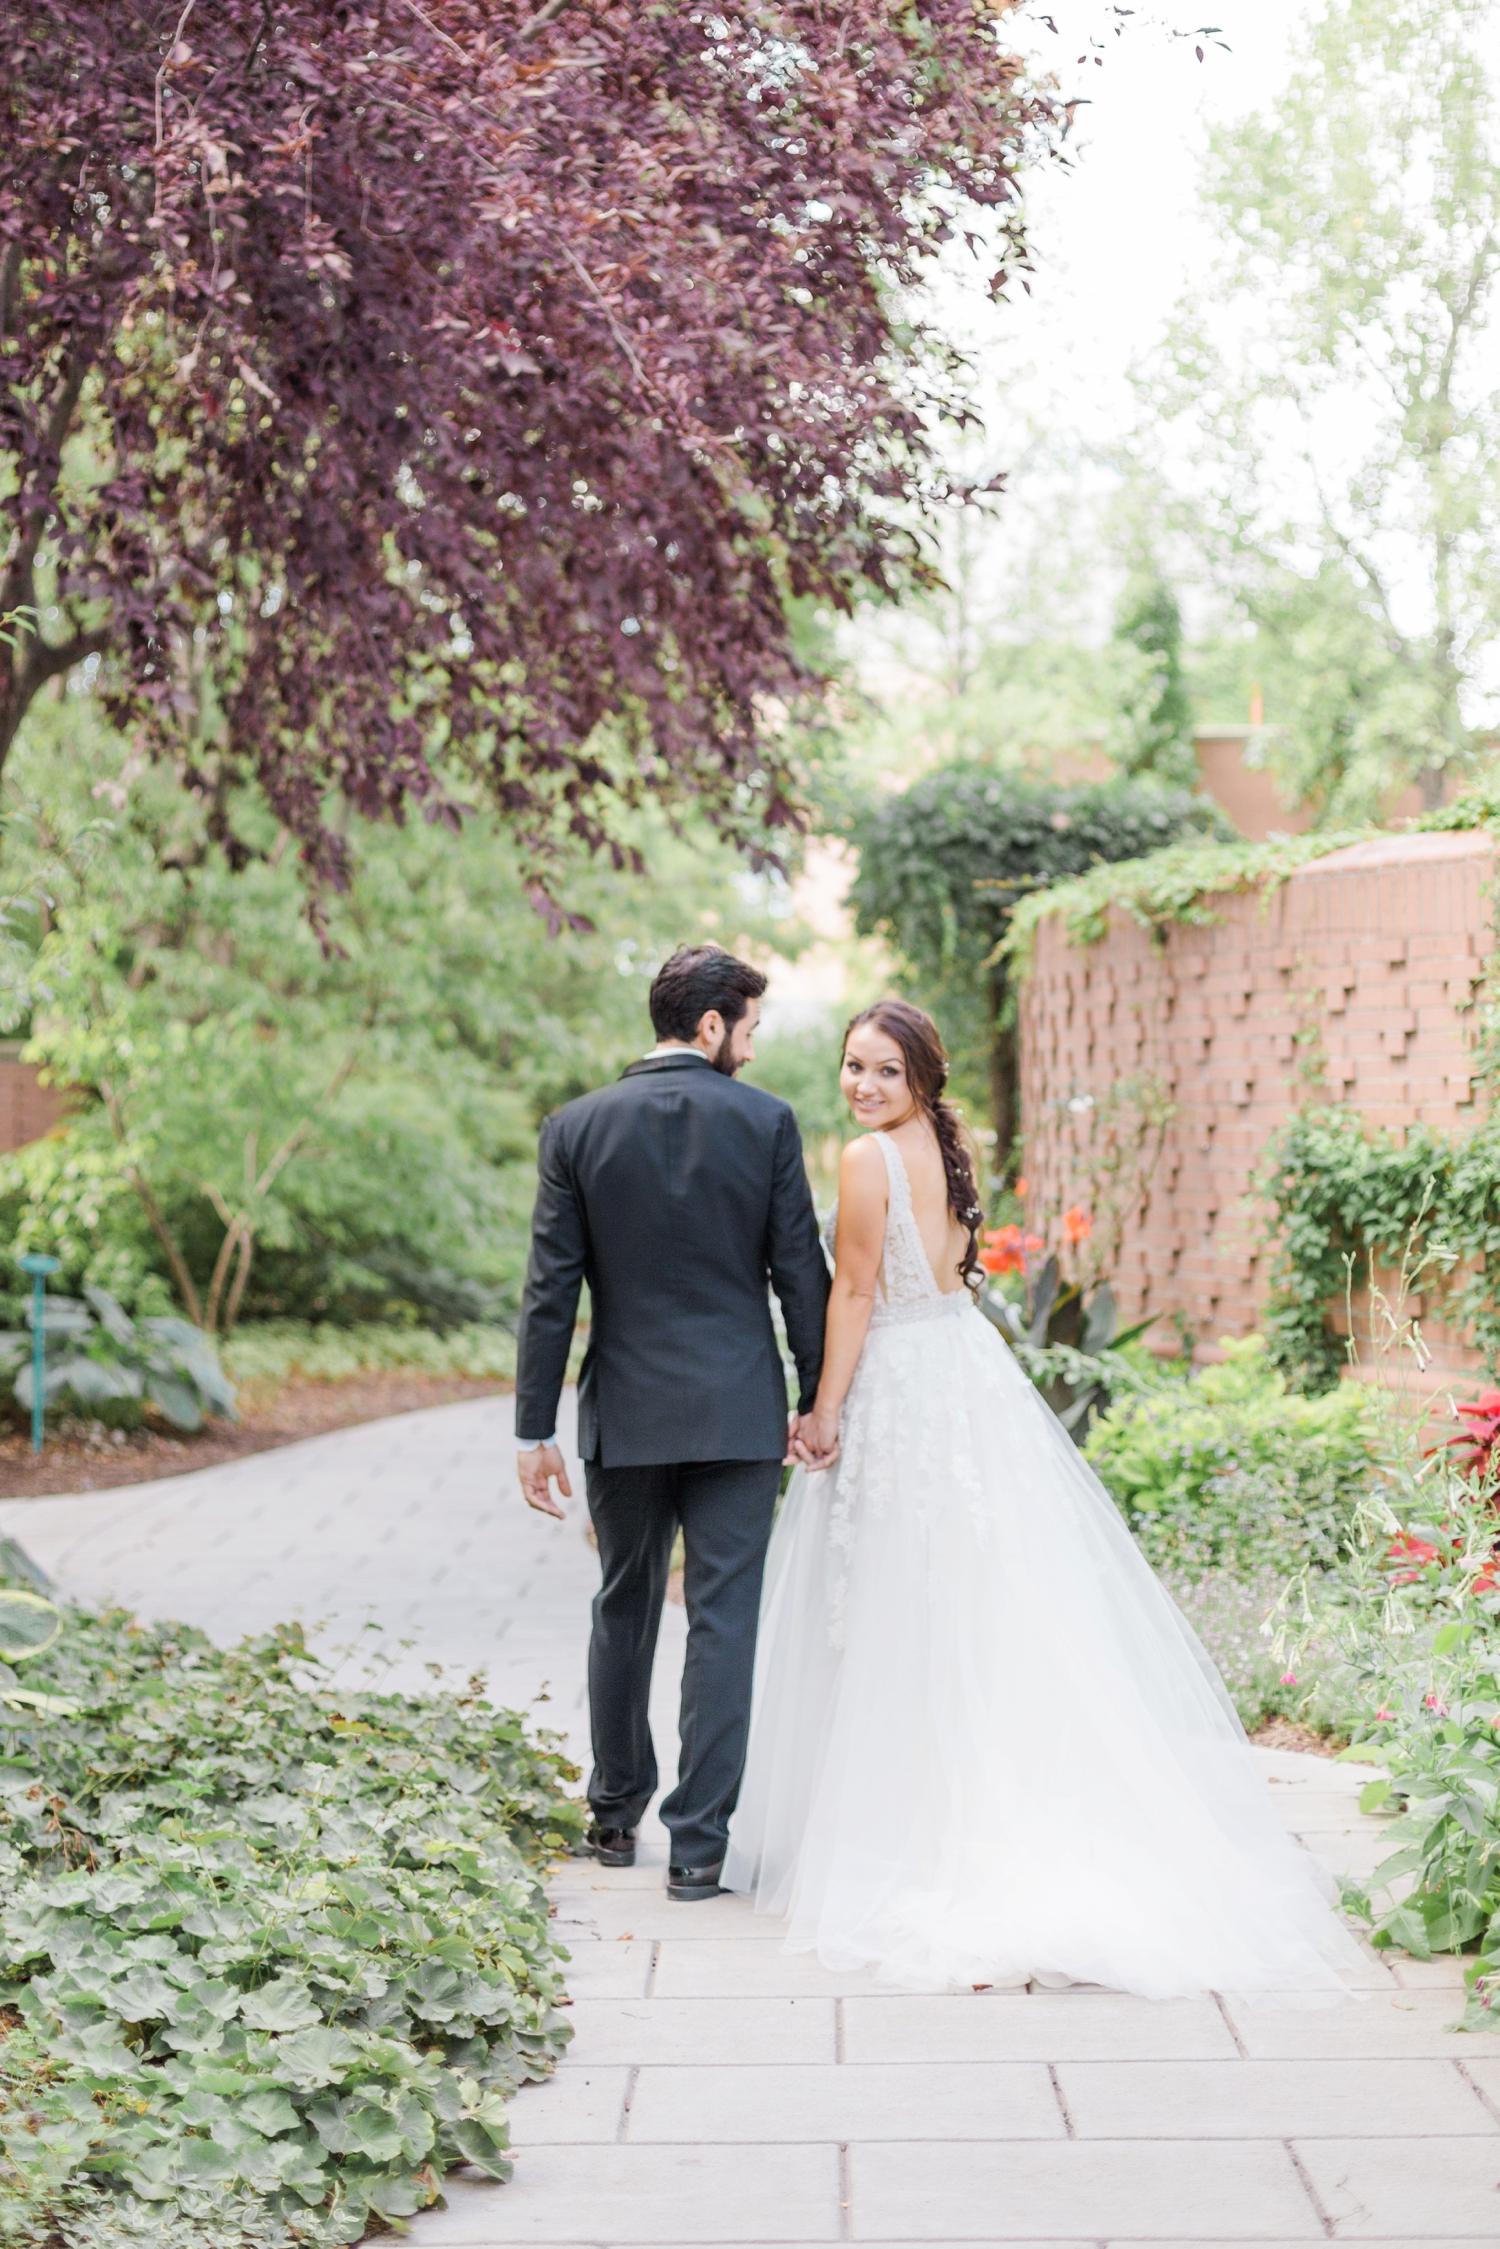 fine-art-indianapolis-wedding-photography_6366.jpg